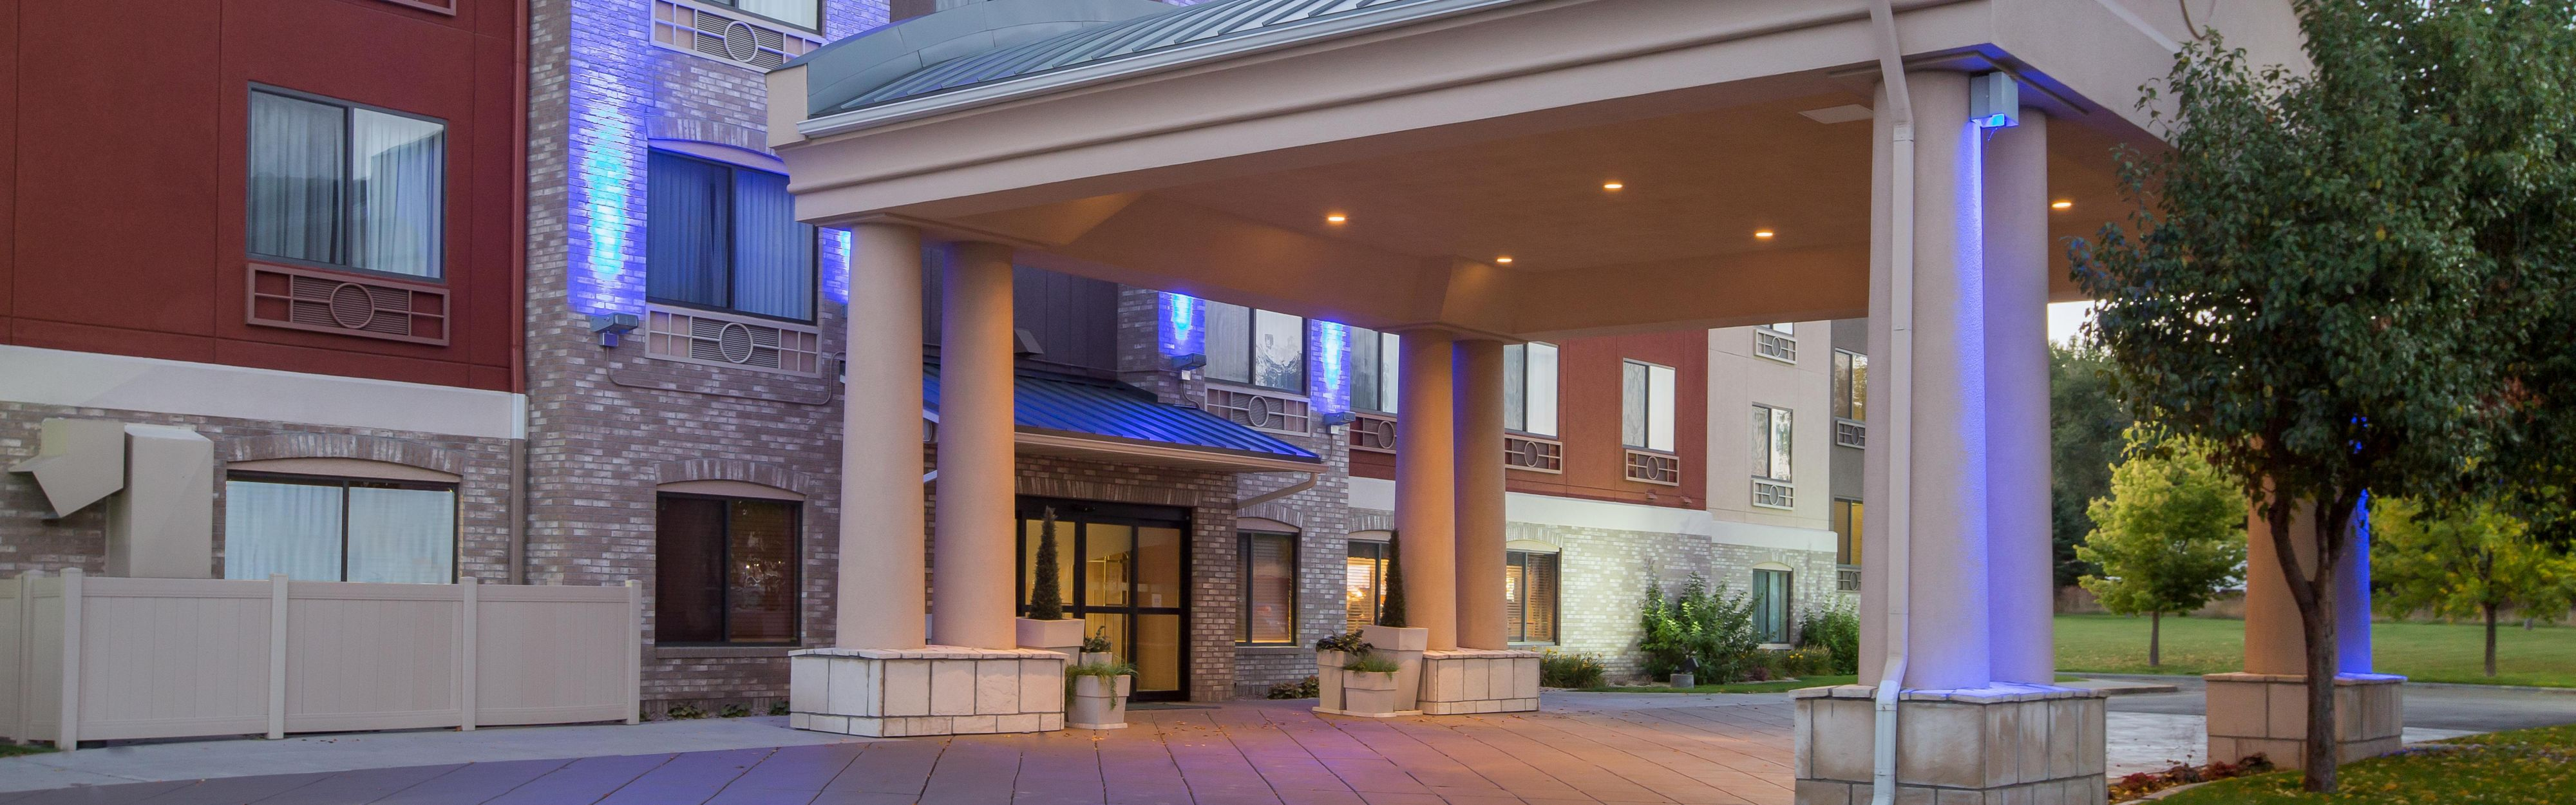 Holiday Inn Express Billings East image 0